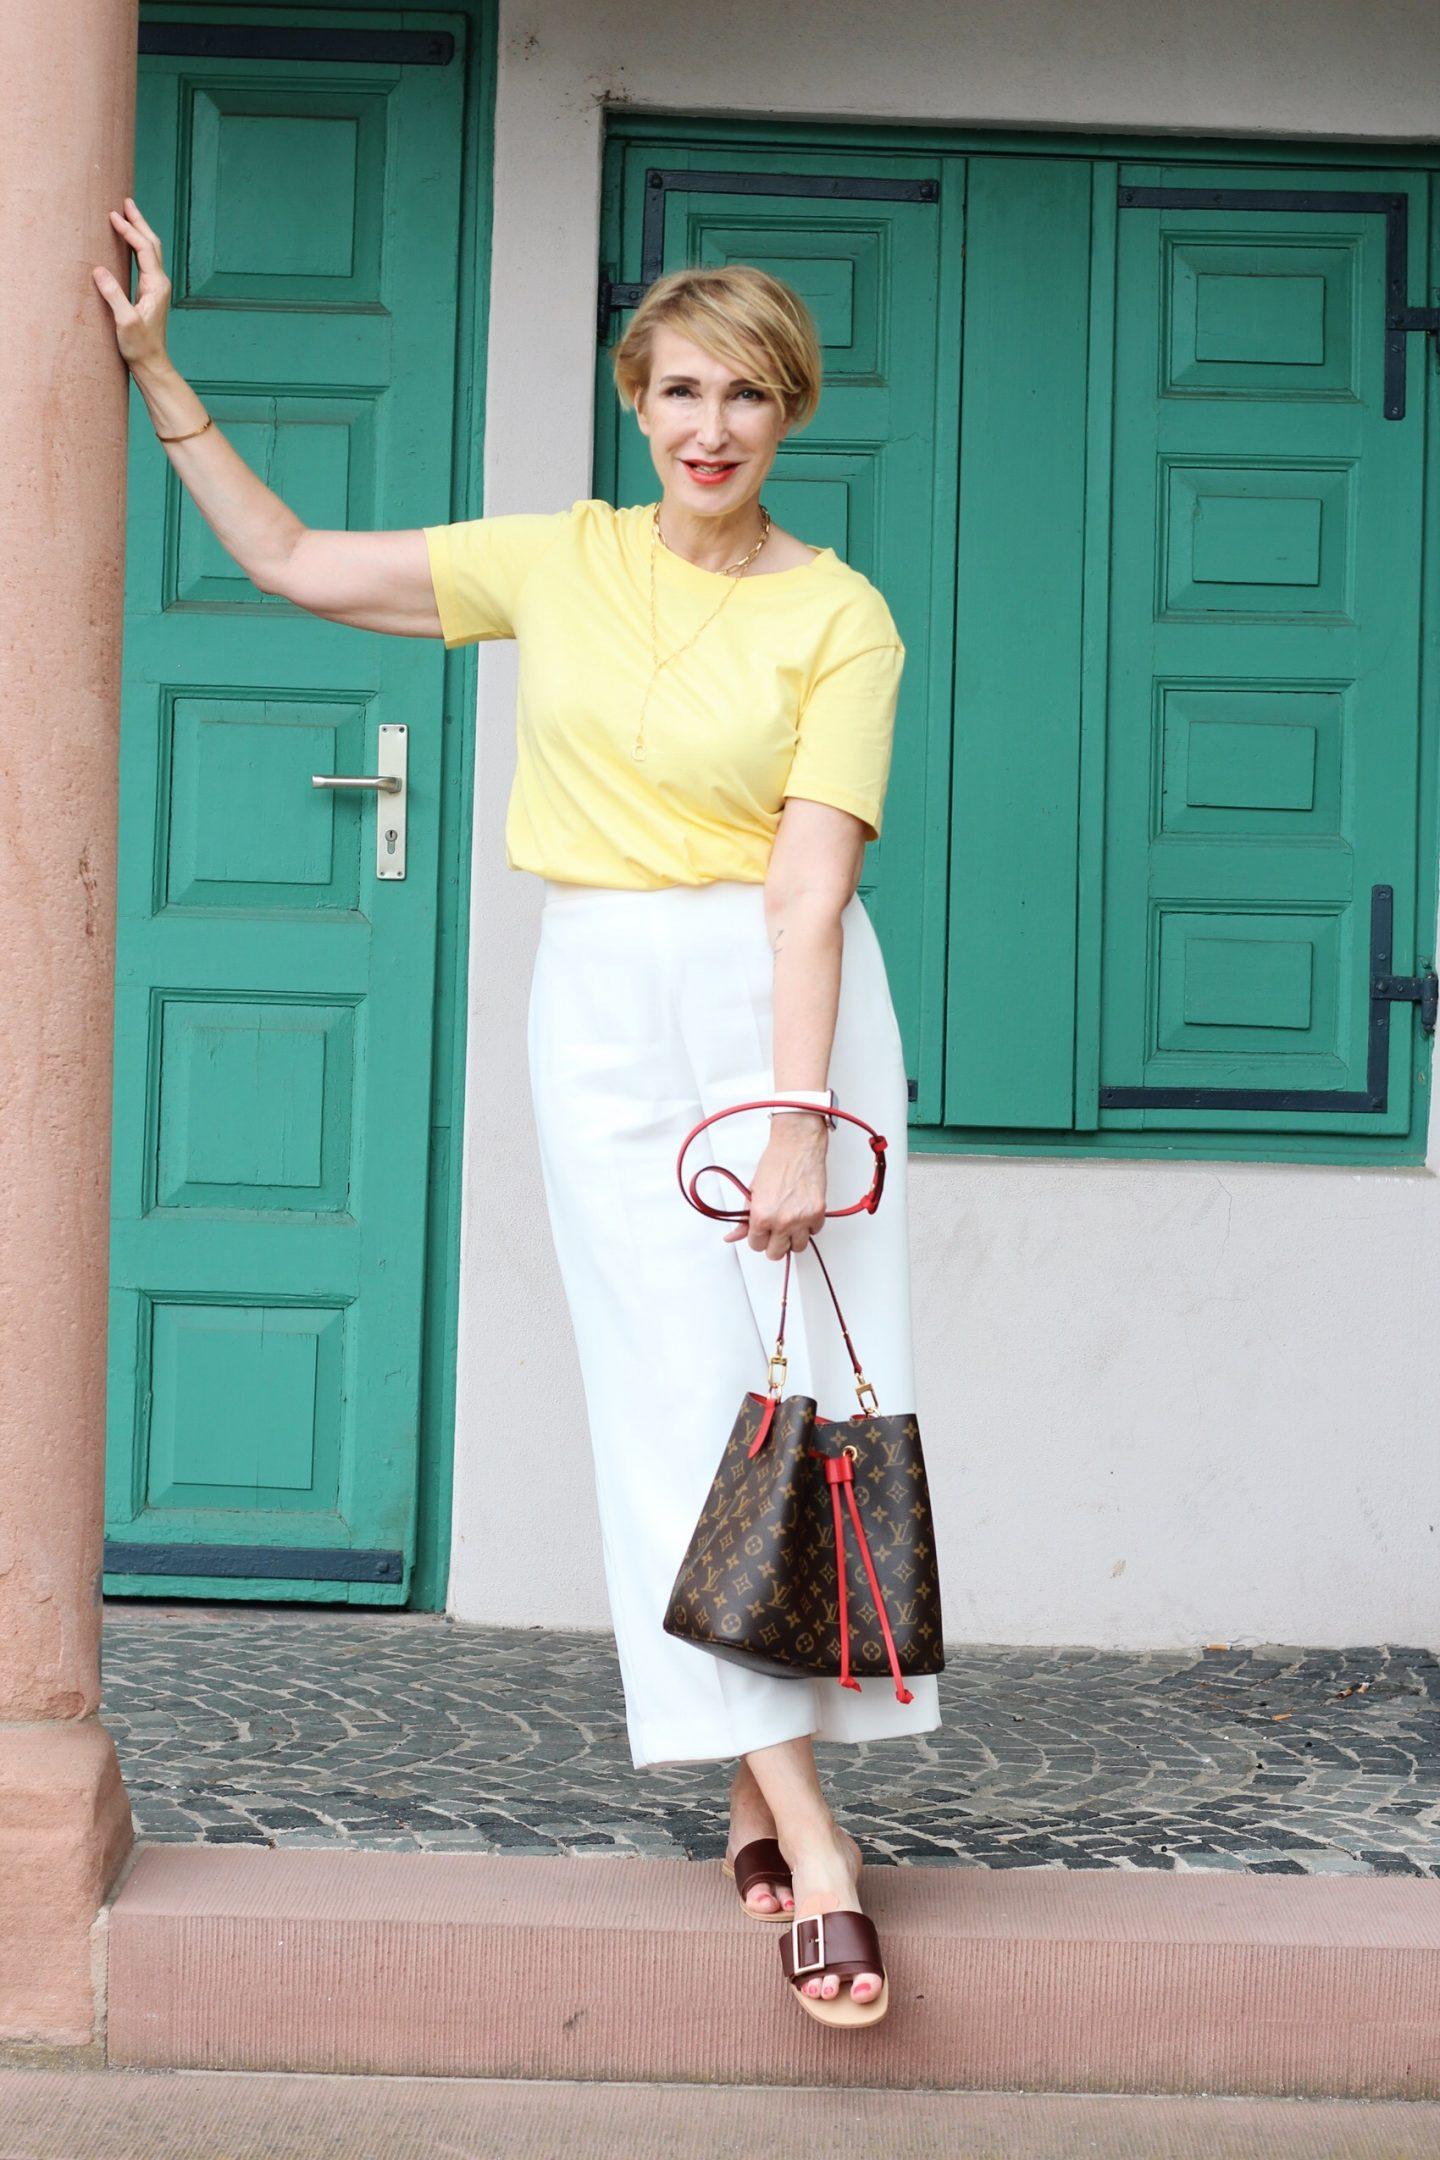 glamupyourlifestyle weiße-hose reise-outfit jeans ü-40-blog ü-50-blog ue-40-blog ue-50-blog